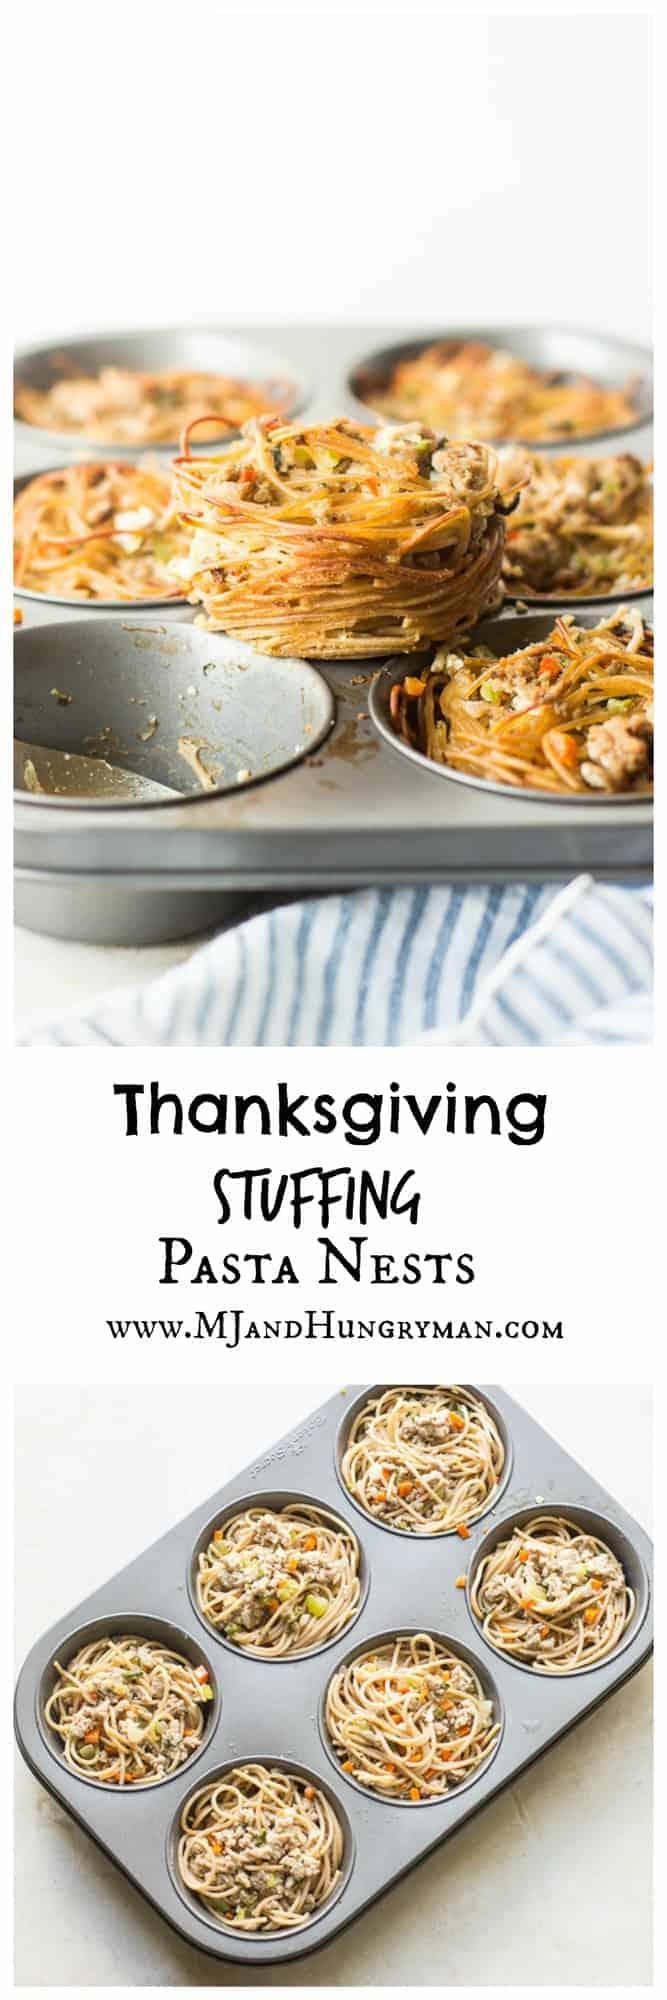 Thanksgiving Stuffing Pasta Nests